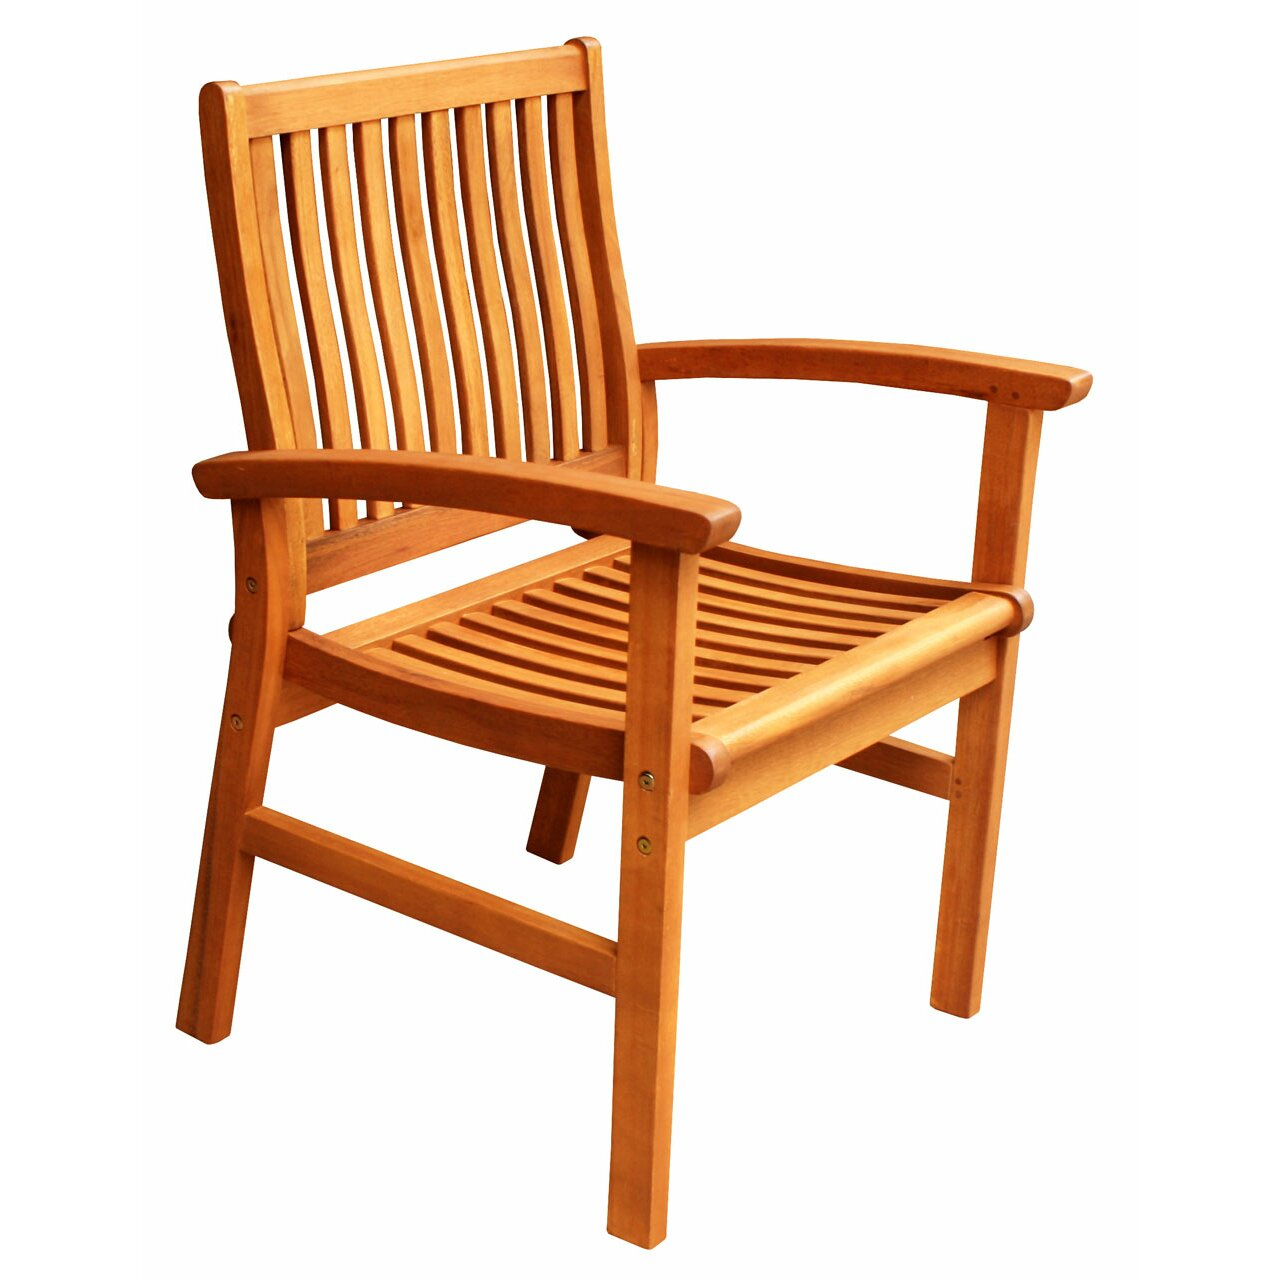 LuuNguyen Hawaii Patio Arm Chair